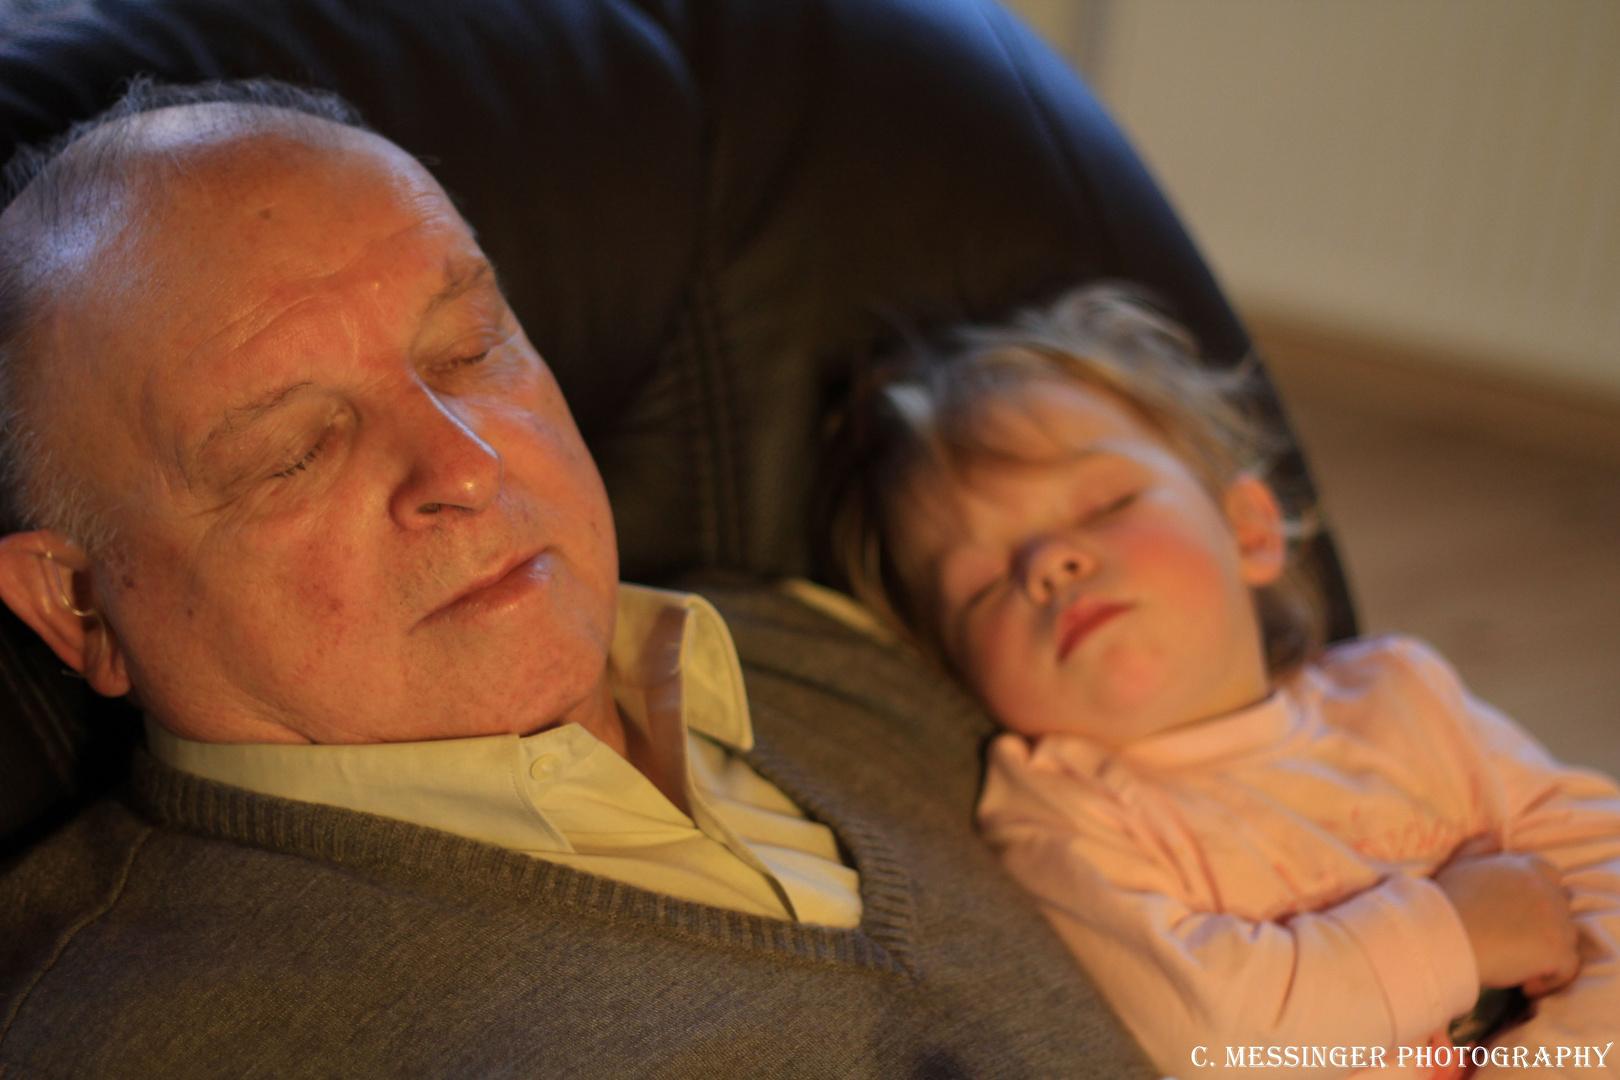 da ist man gerne Opa!!!